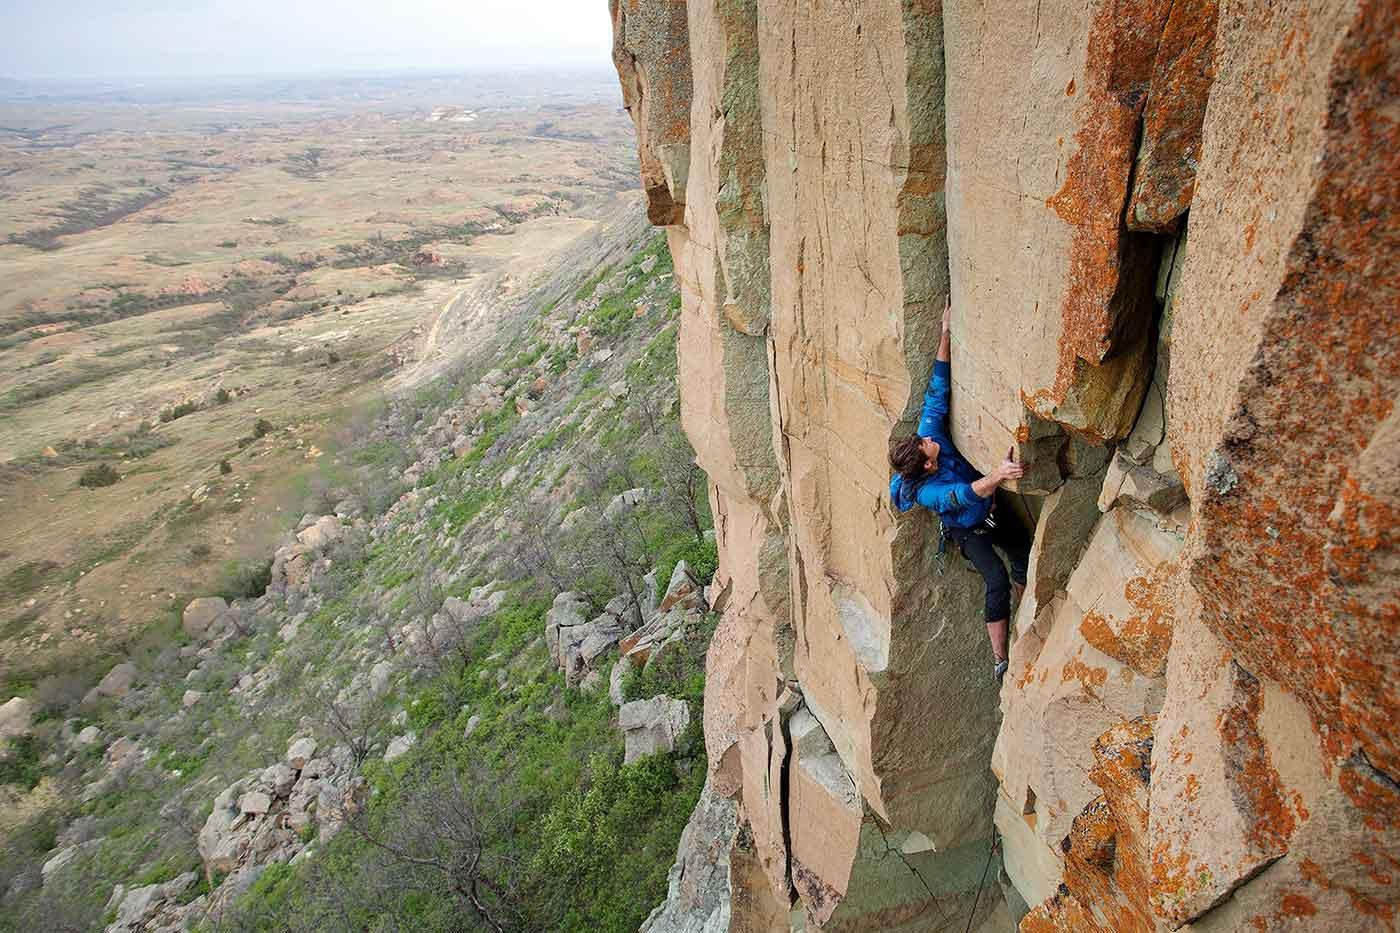 Rock Climbing North Dakota Great Plains Get Guide